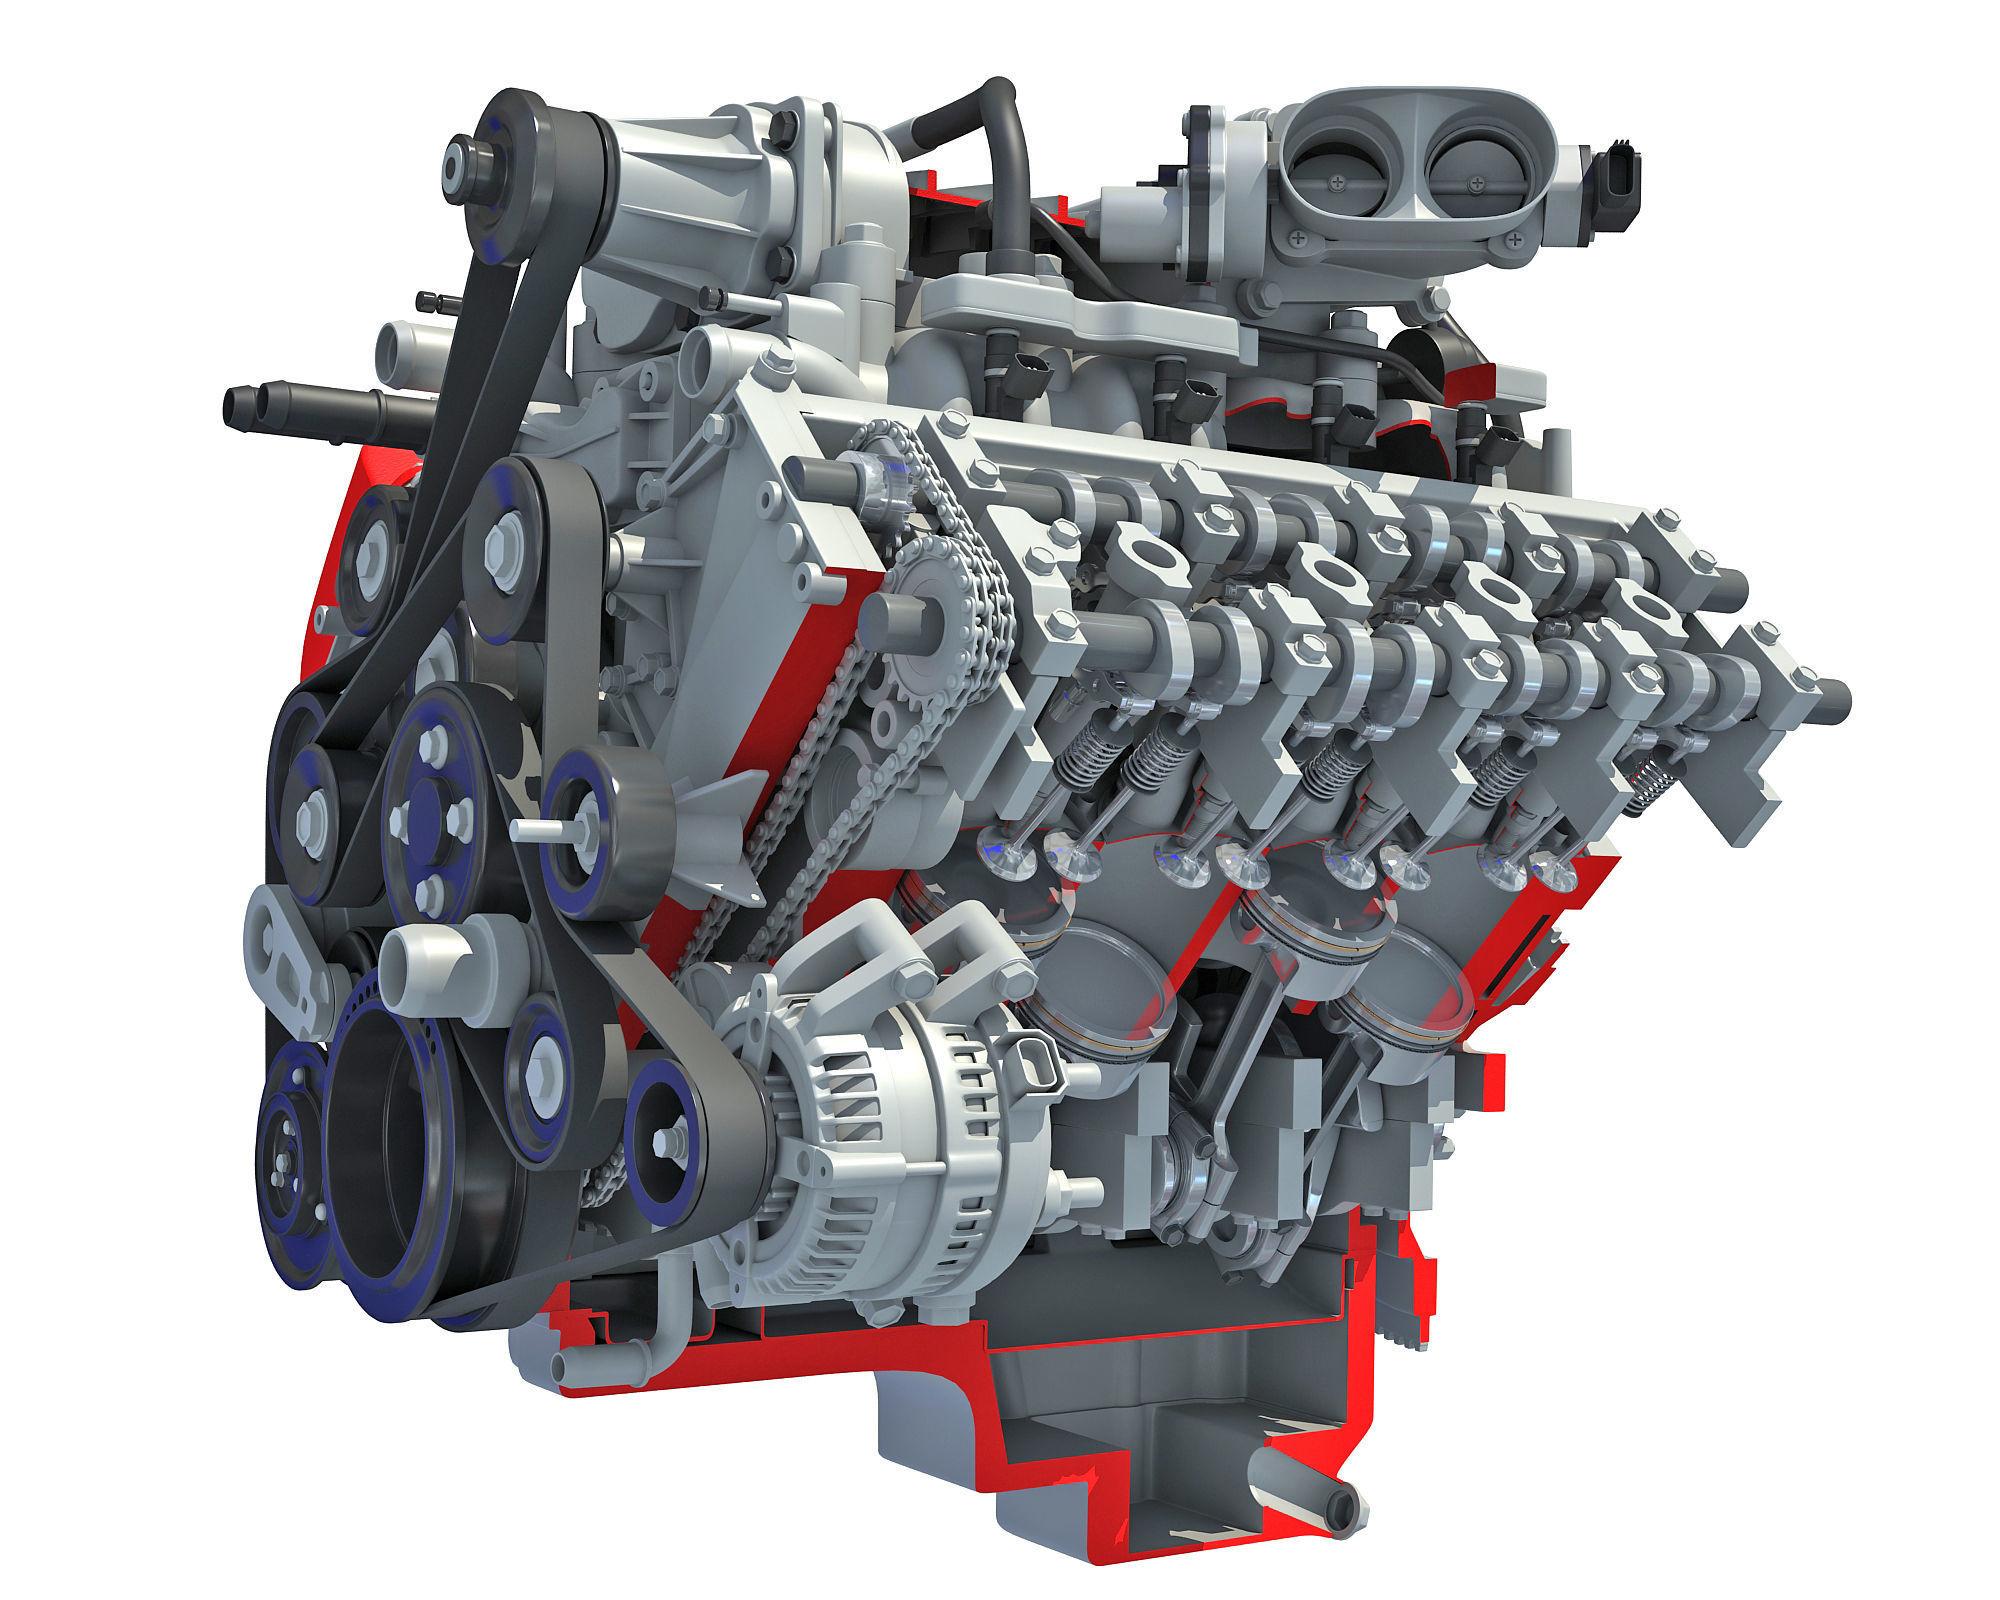 Sectioned Animated V8 Engine